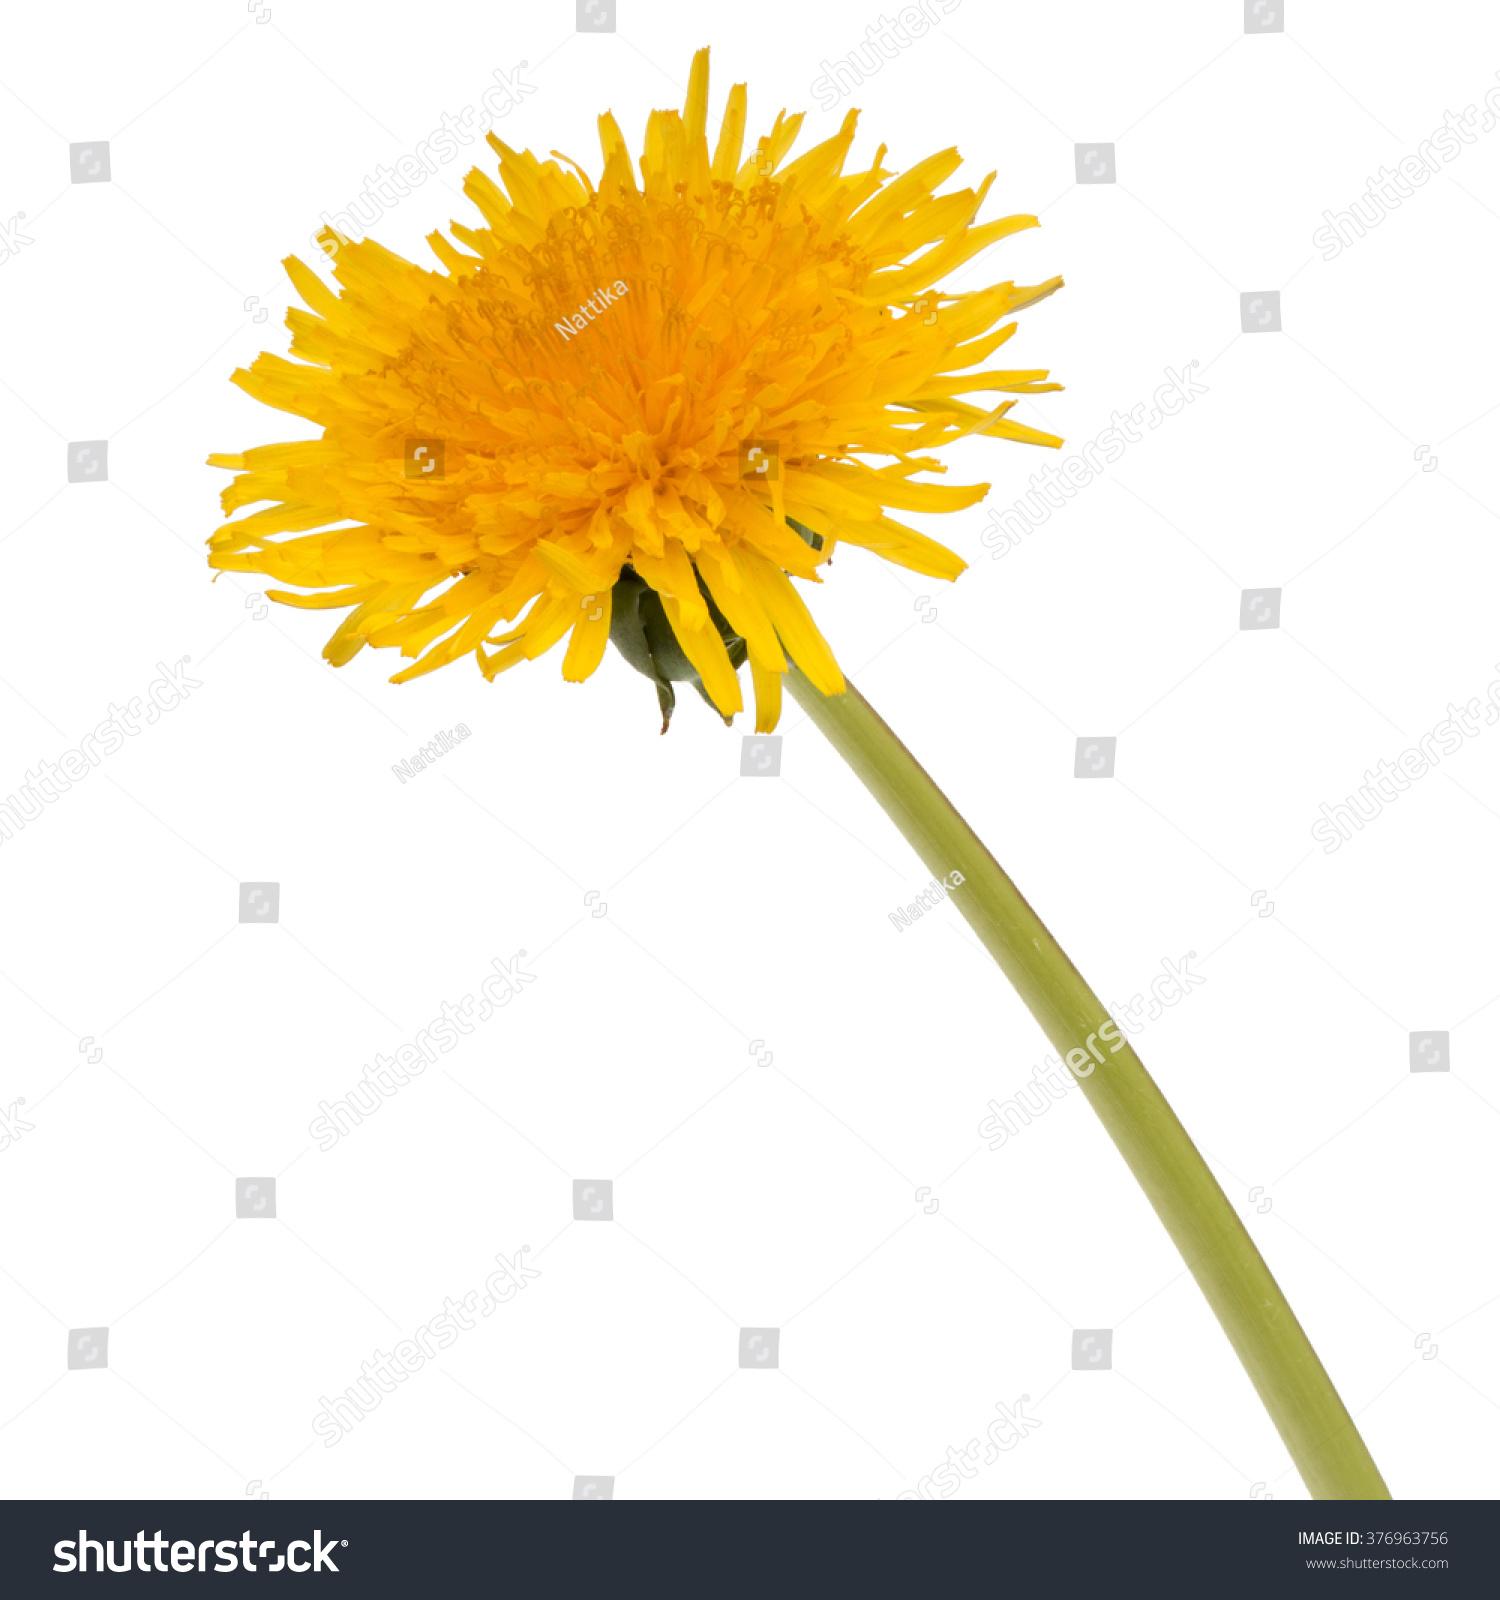 dandelion flower isolated on white background cutout | ez canvas